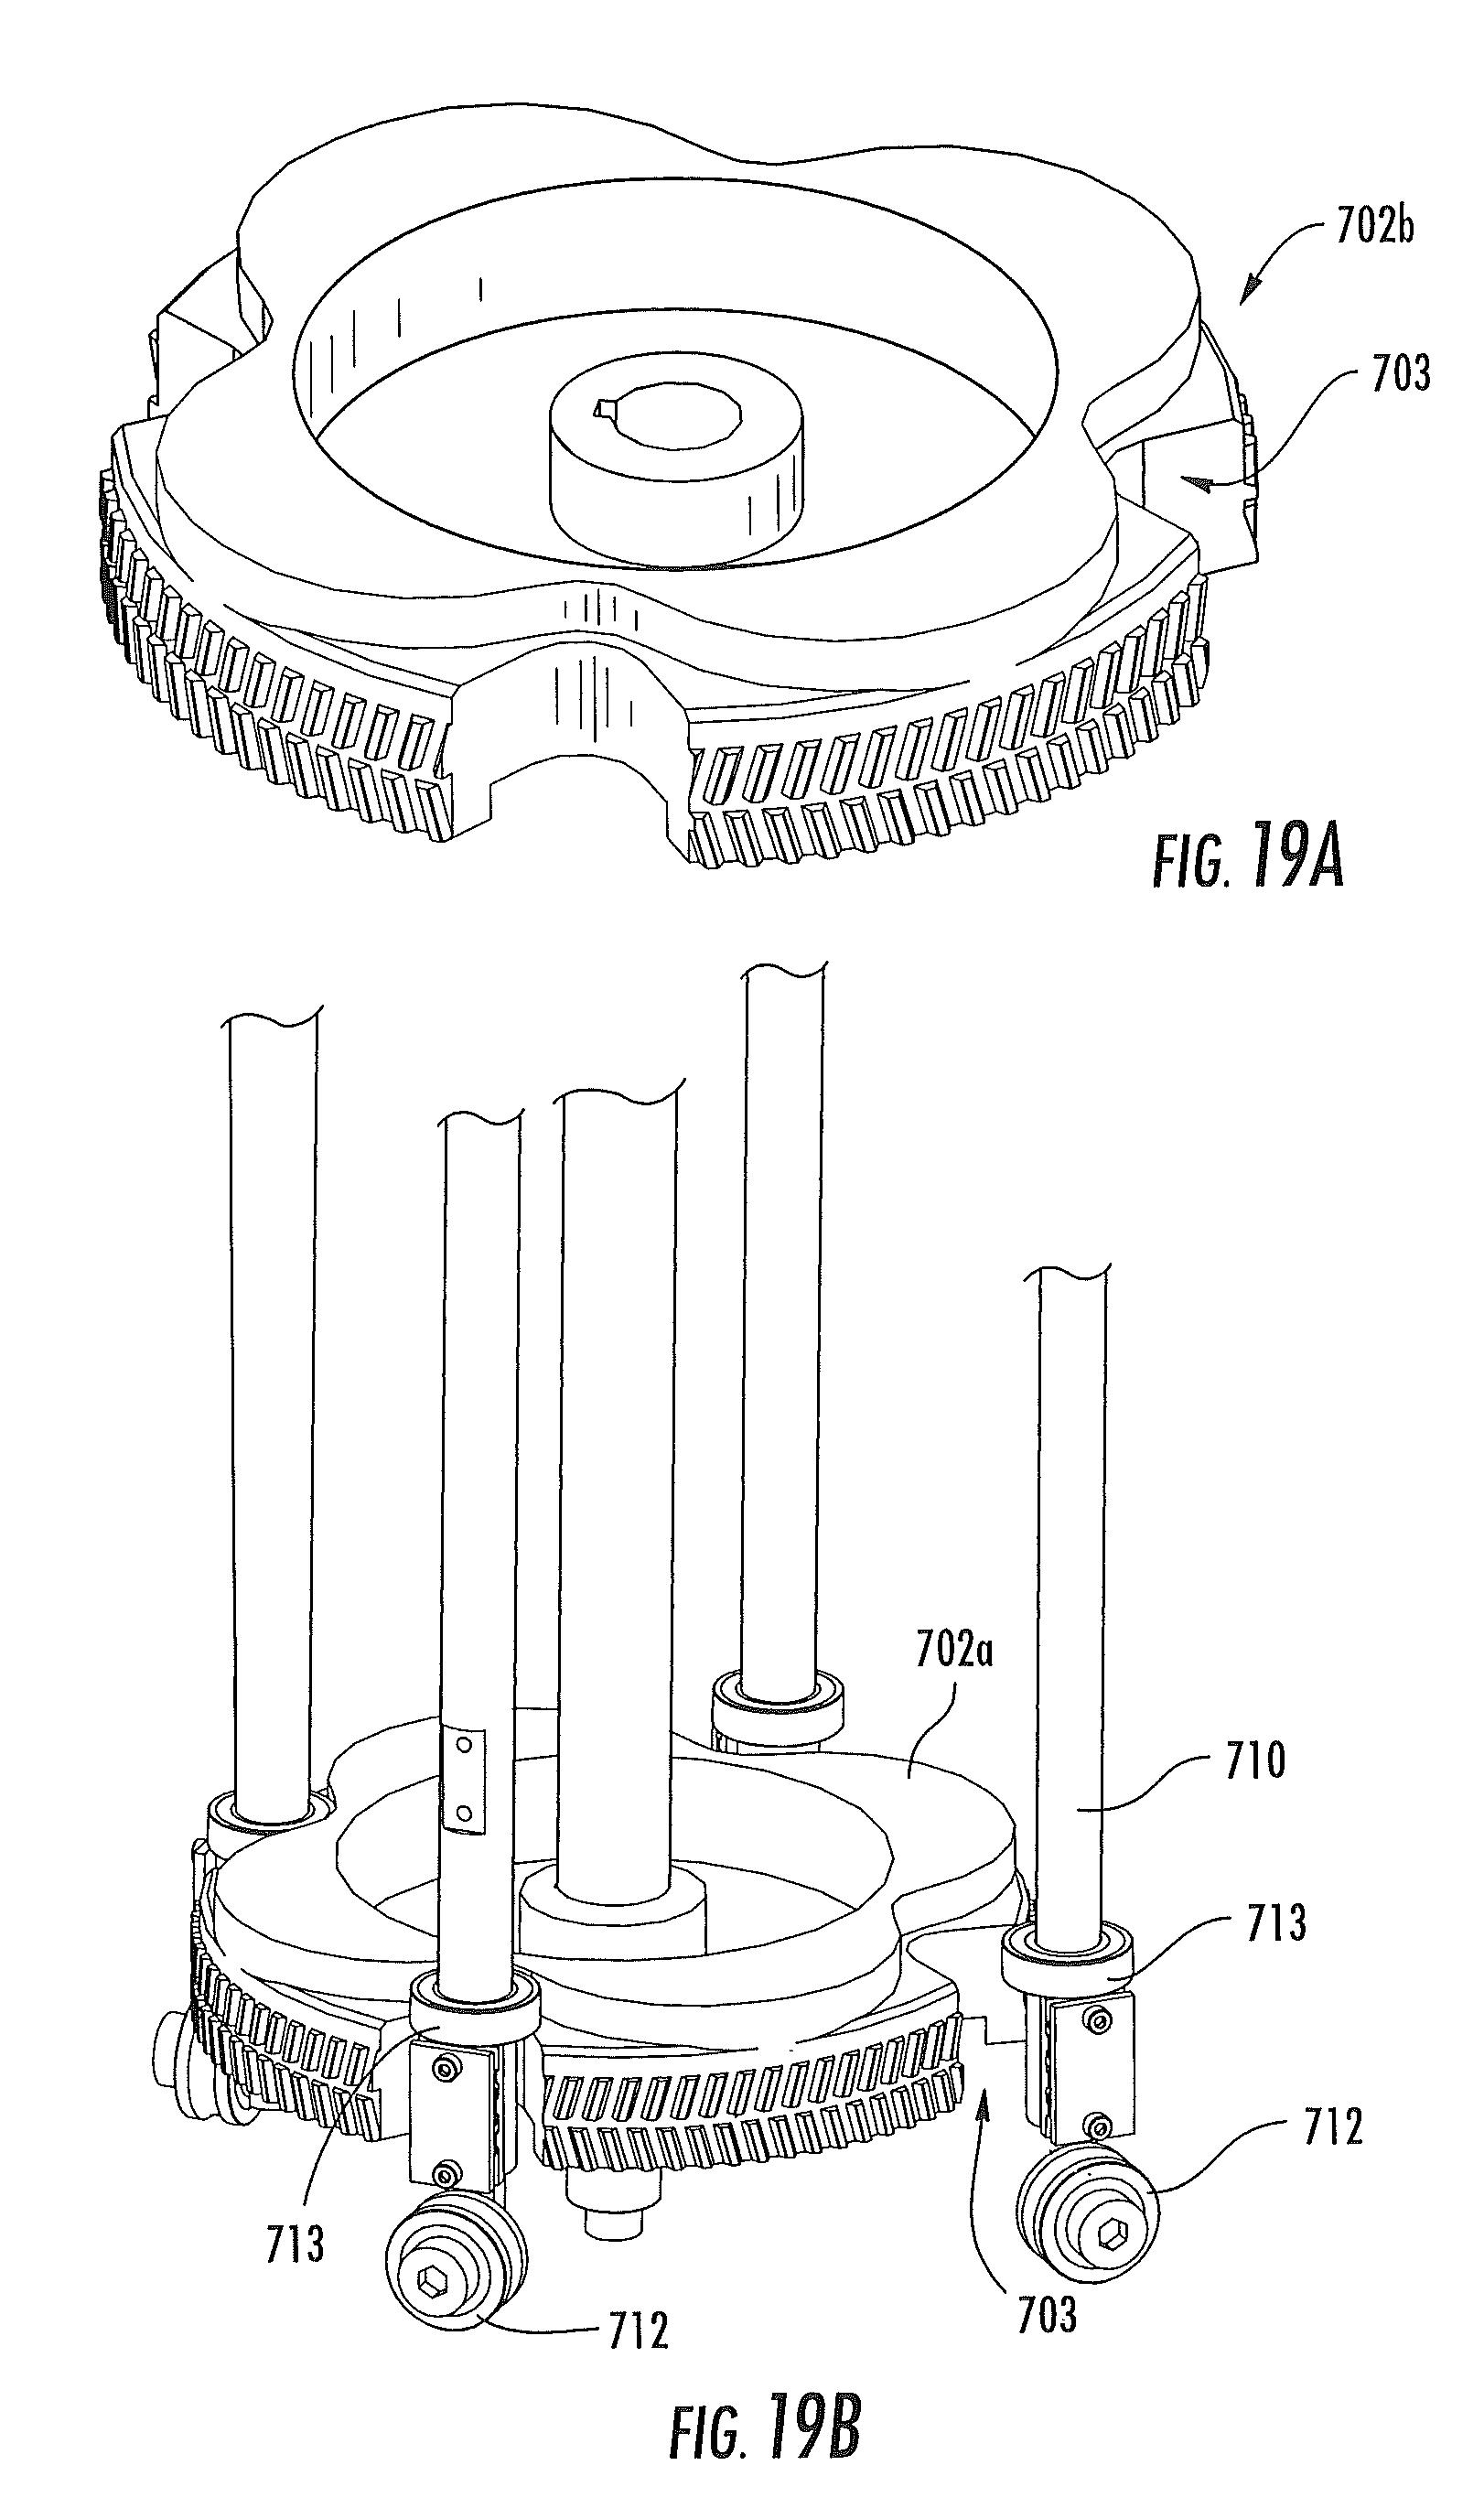 Patent US 9,399,543 B2